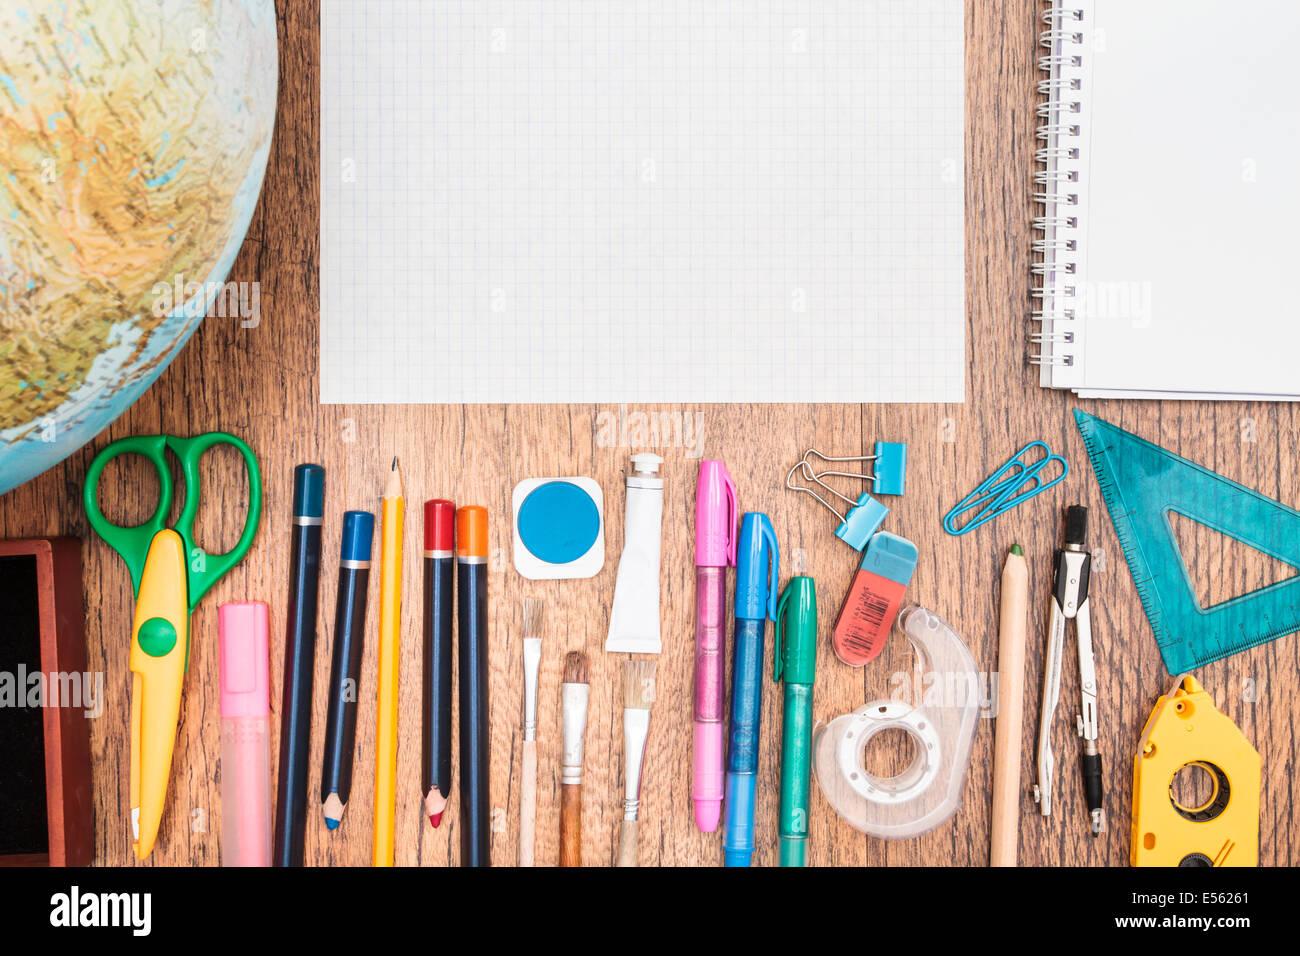 Merveilleux Top View Of School Accessories On A Desk